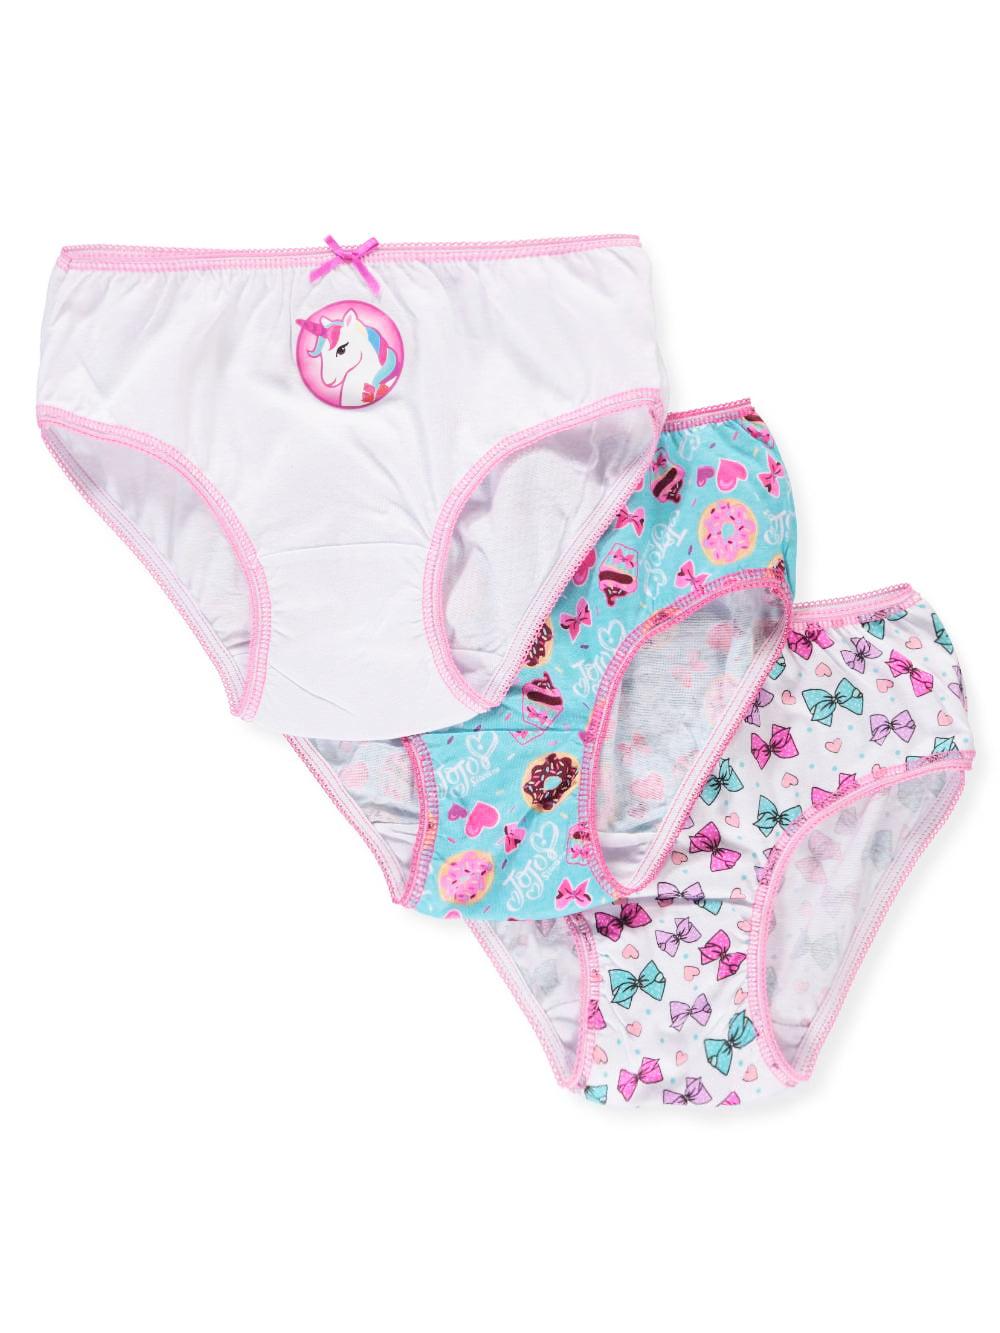 Love Struck Ladies Socks Bunnies 4-8 Size New 3-pack Spring